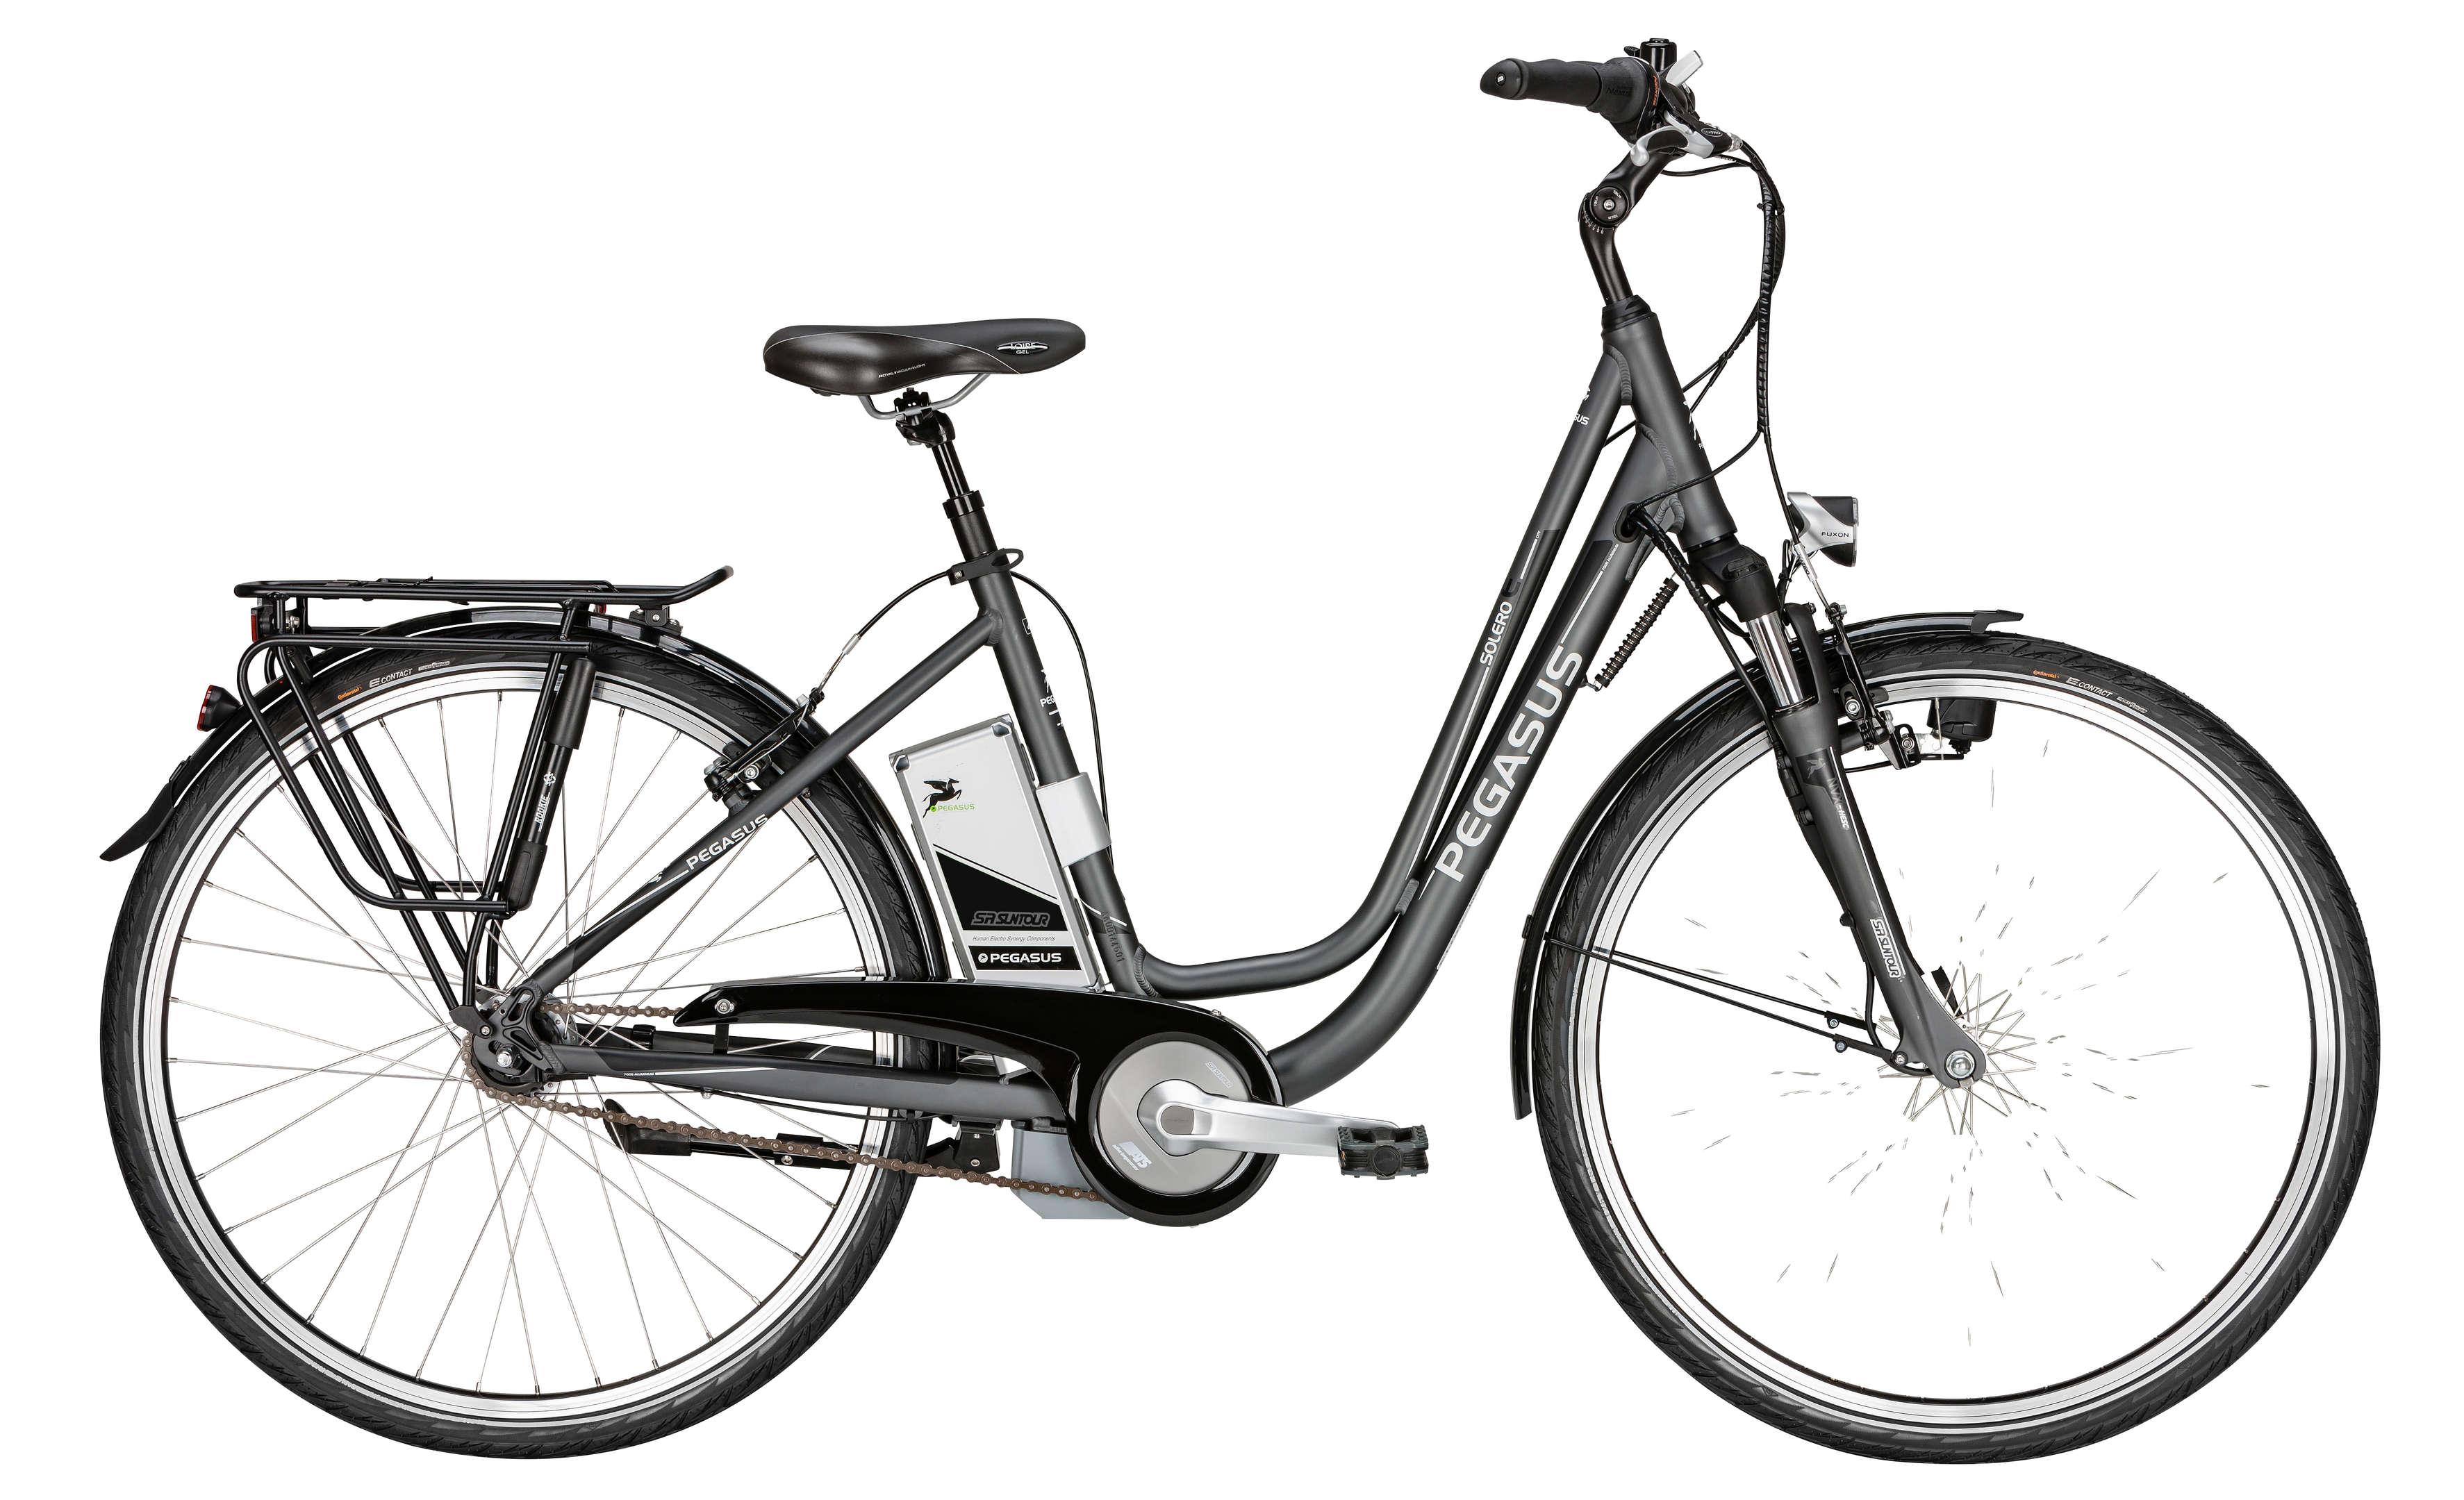 pegasus e bike solero e hercules bike leasing powered by. Black Bedroom Furniture Sets. Home Design Ideas